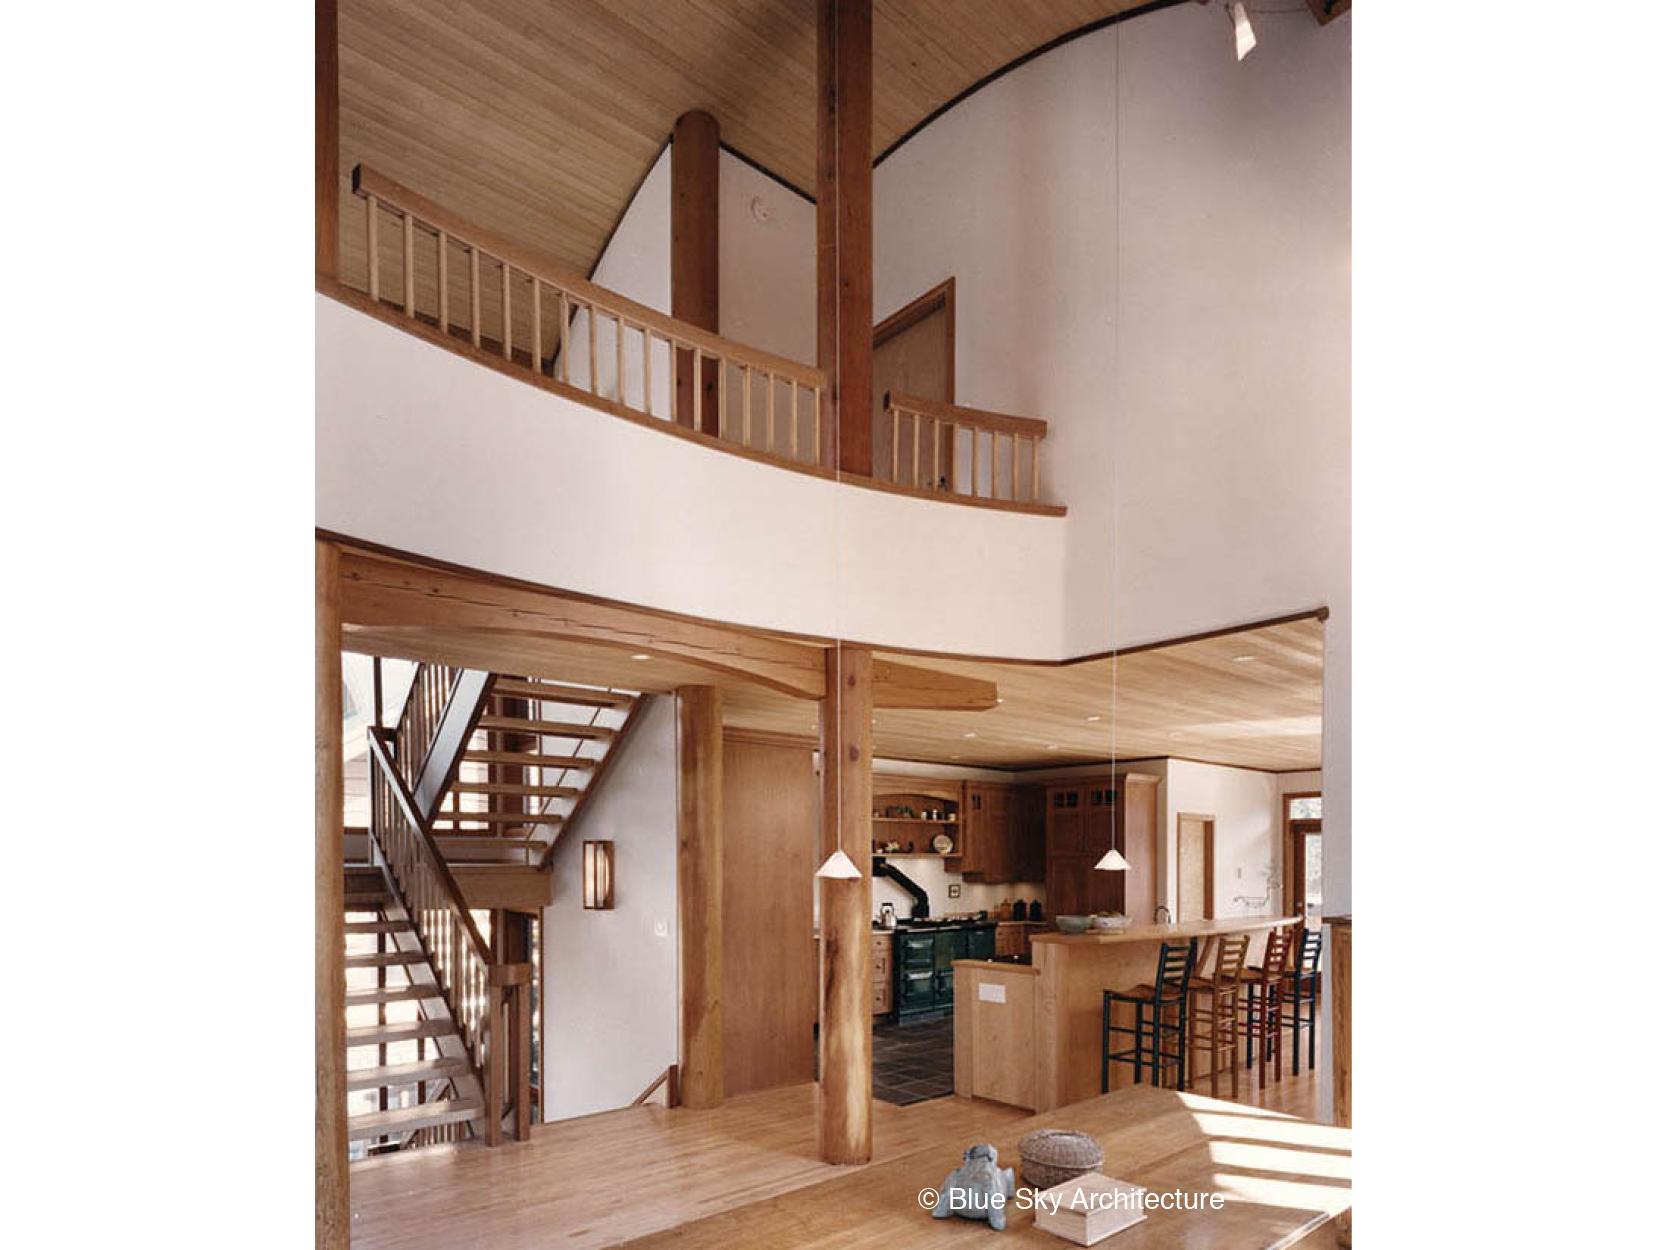 Interior Mezzanine with Wood Balustrade